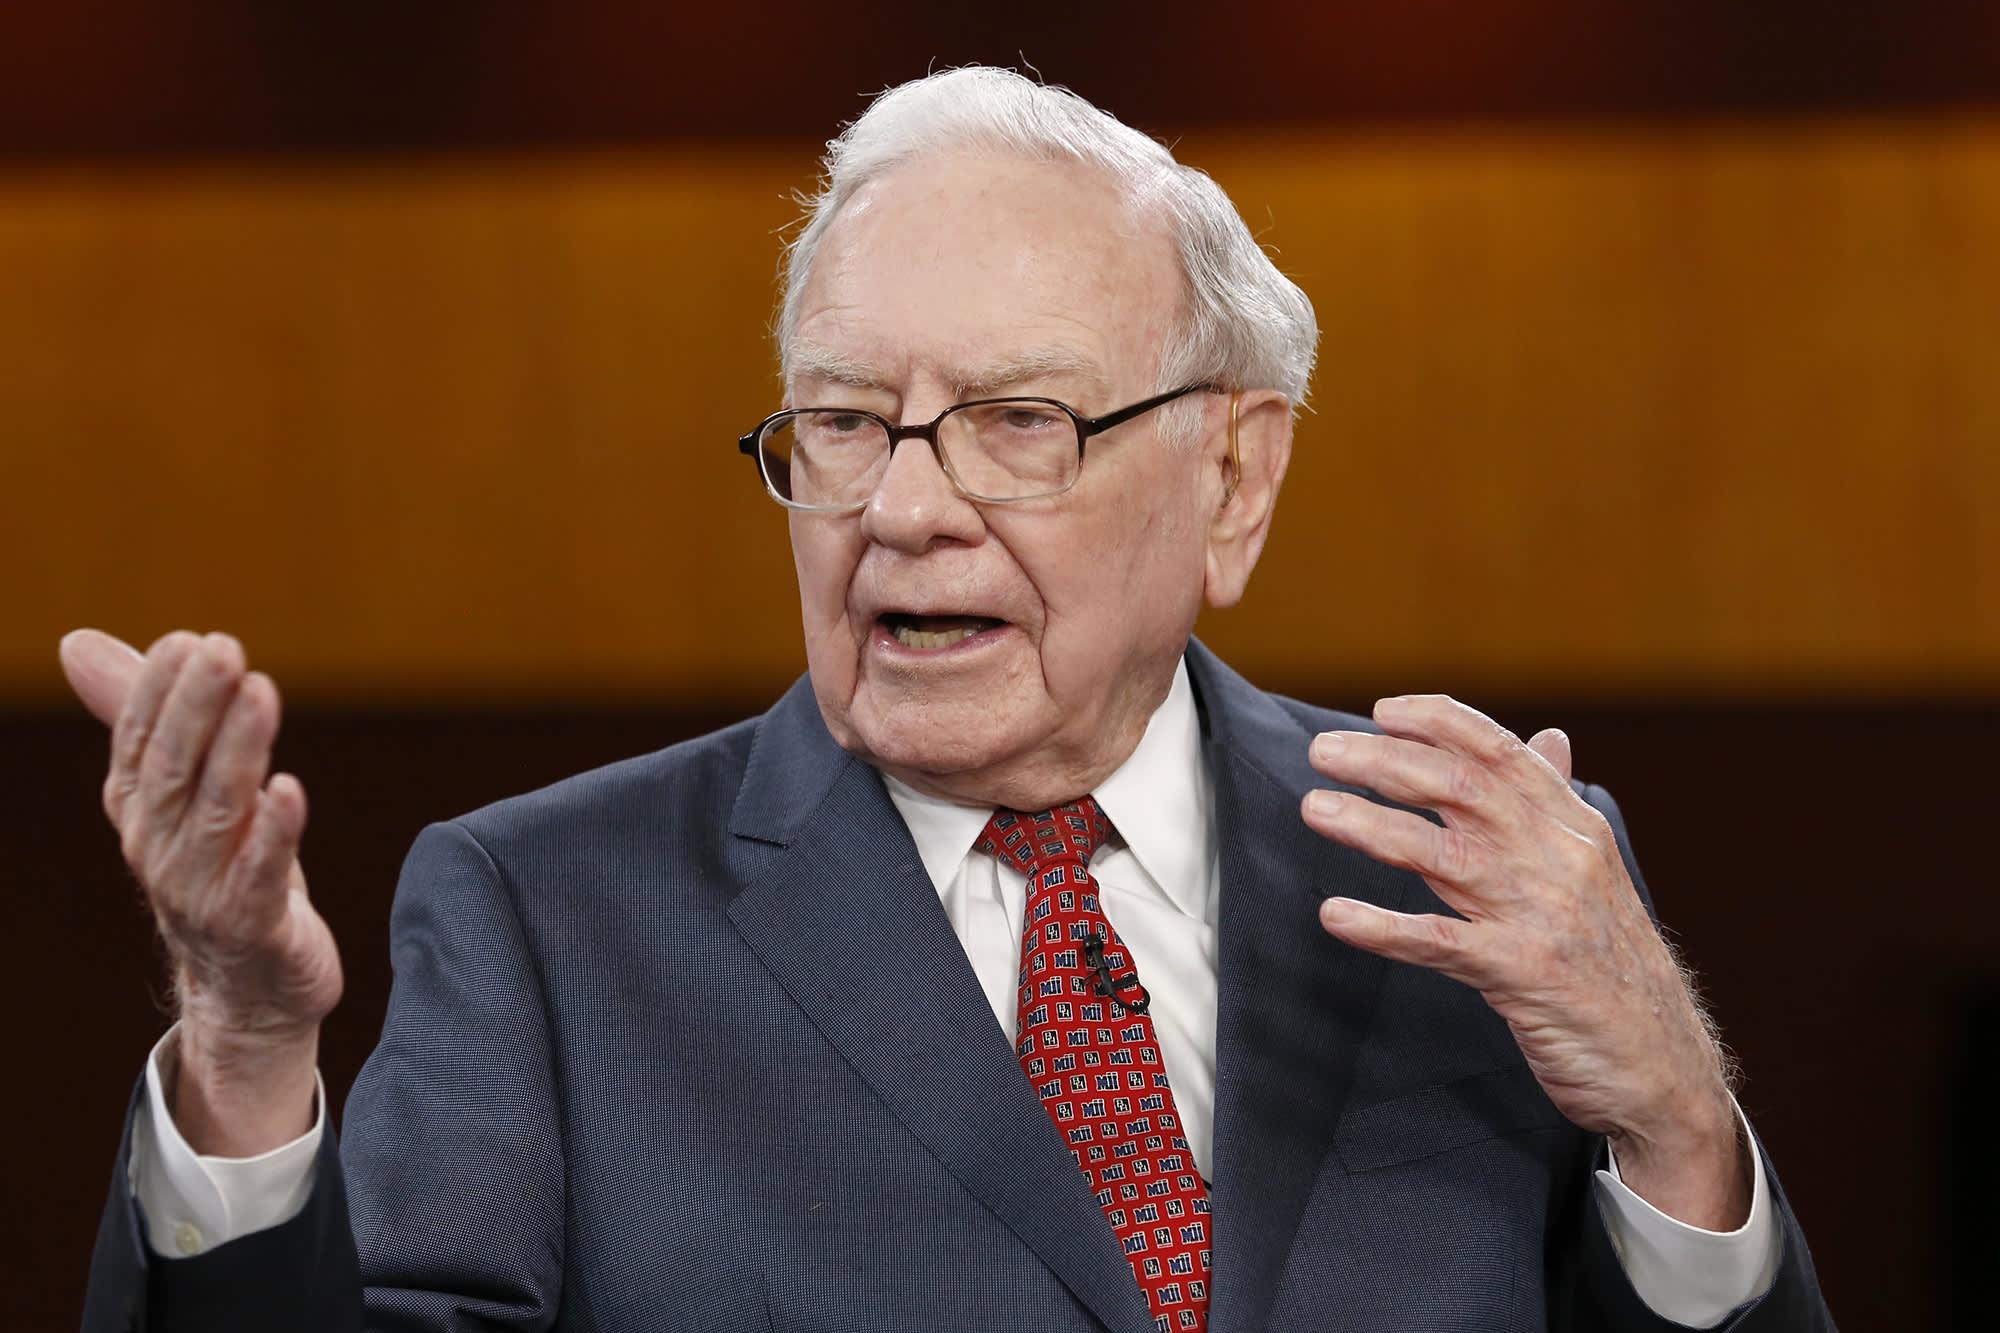 Warren Buffett says 'never bet against America' in letter trumpeting Berkshire's U.S.-based assets